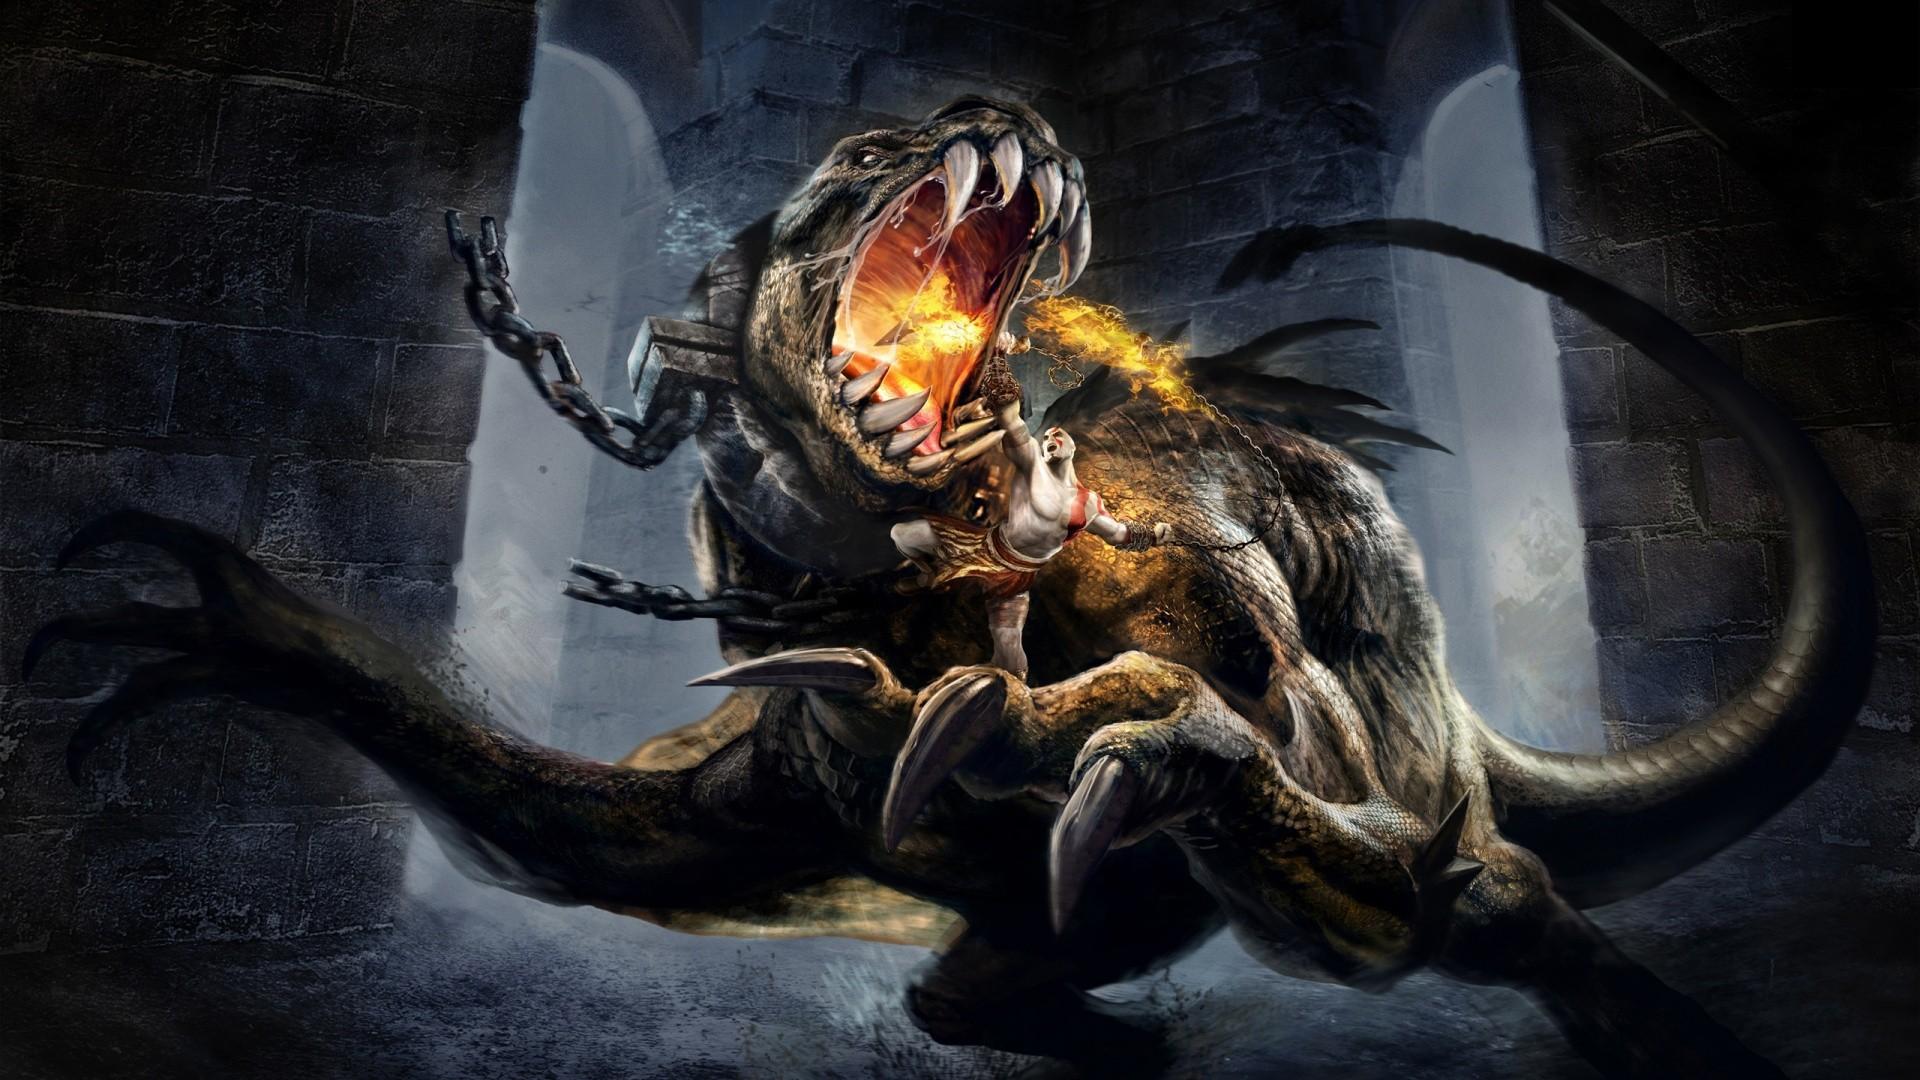 God of war ascension the big rat wallpapers and images god of war ascension the big rat voltagebd Choice Image